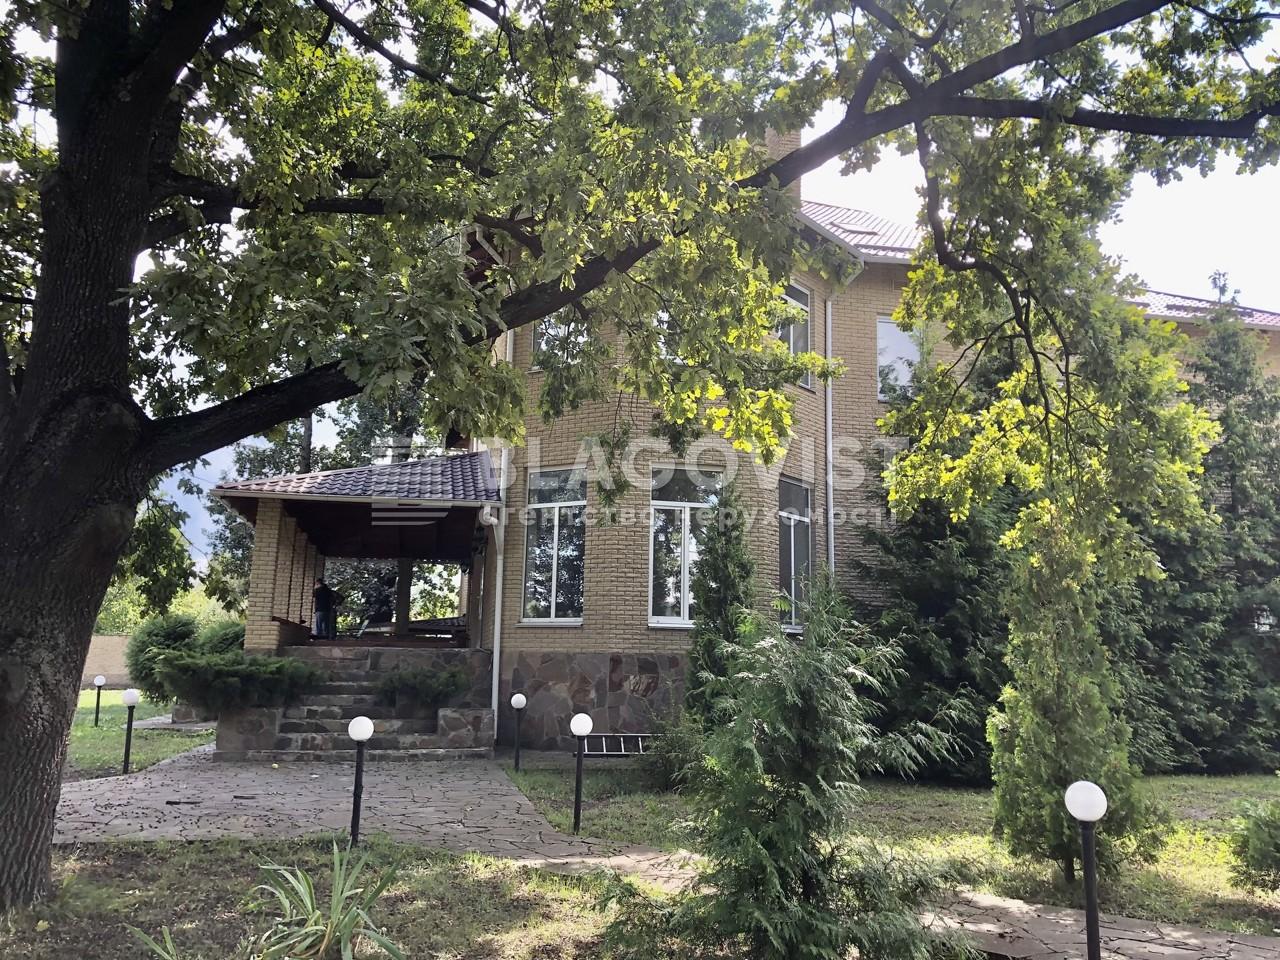 Квартира C-109816, Клавдии Радченко, 14, Киев - Фото 14